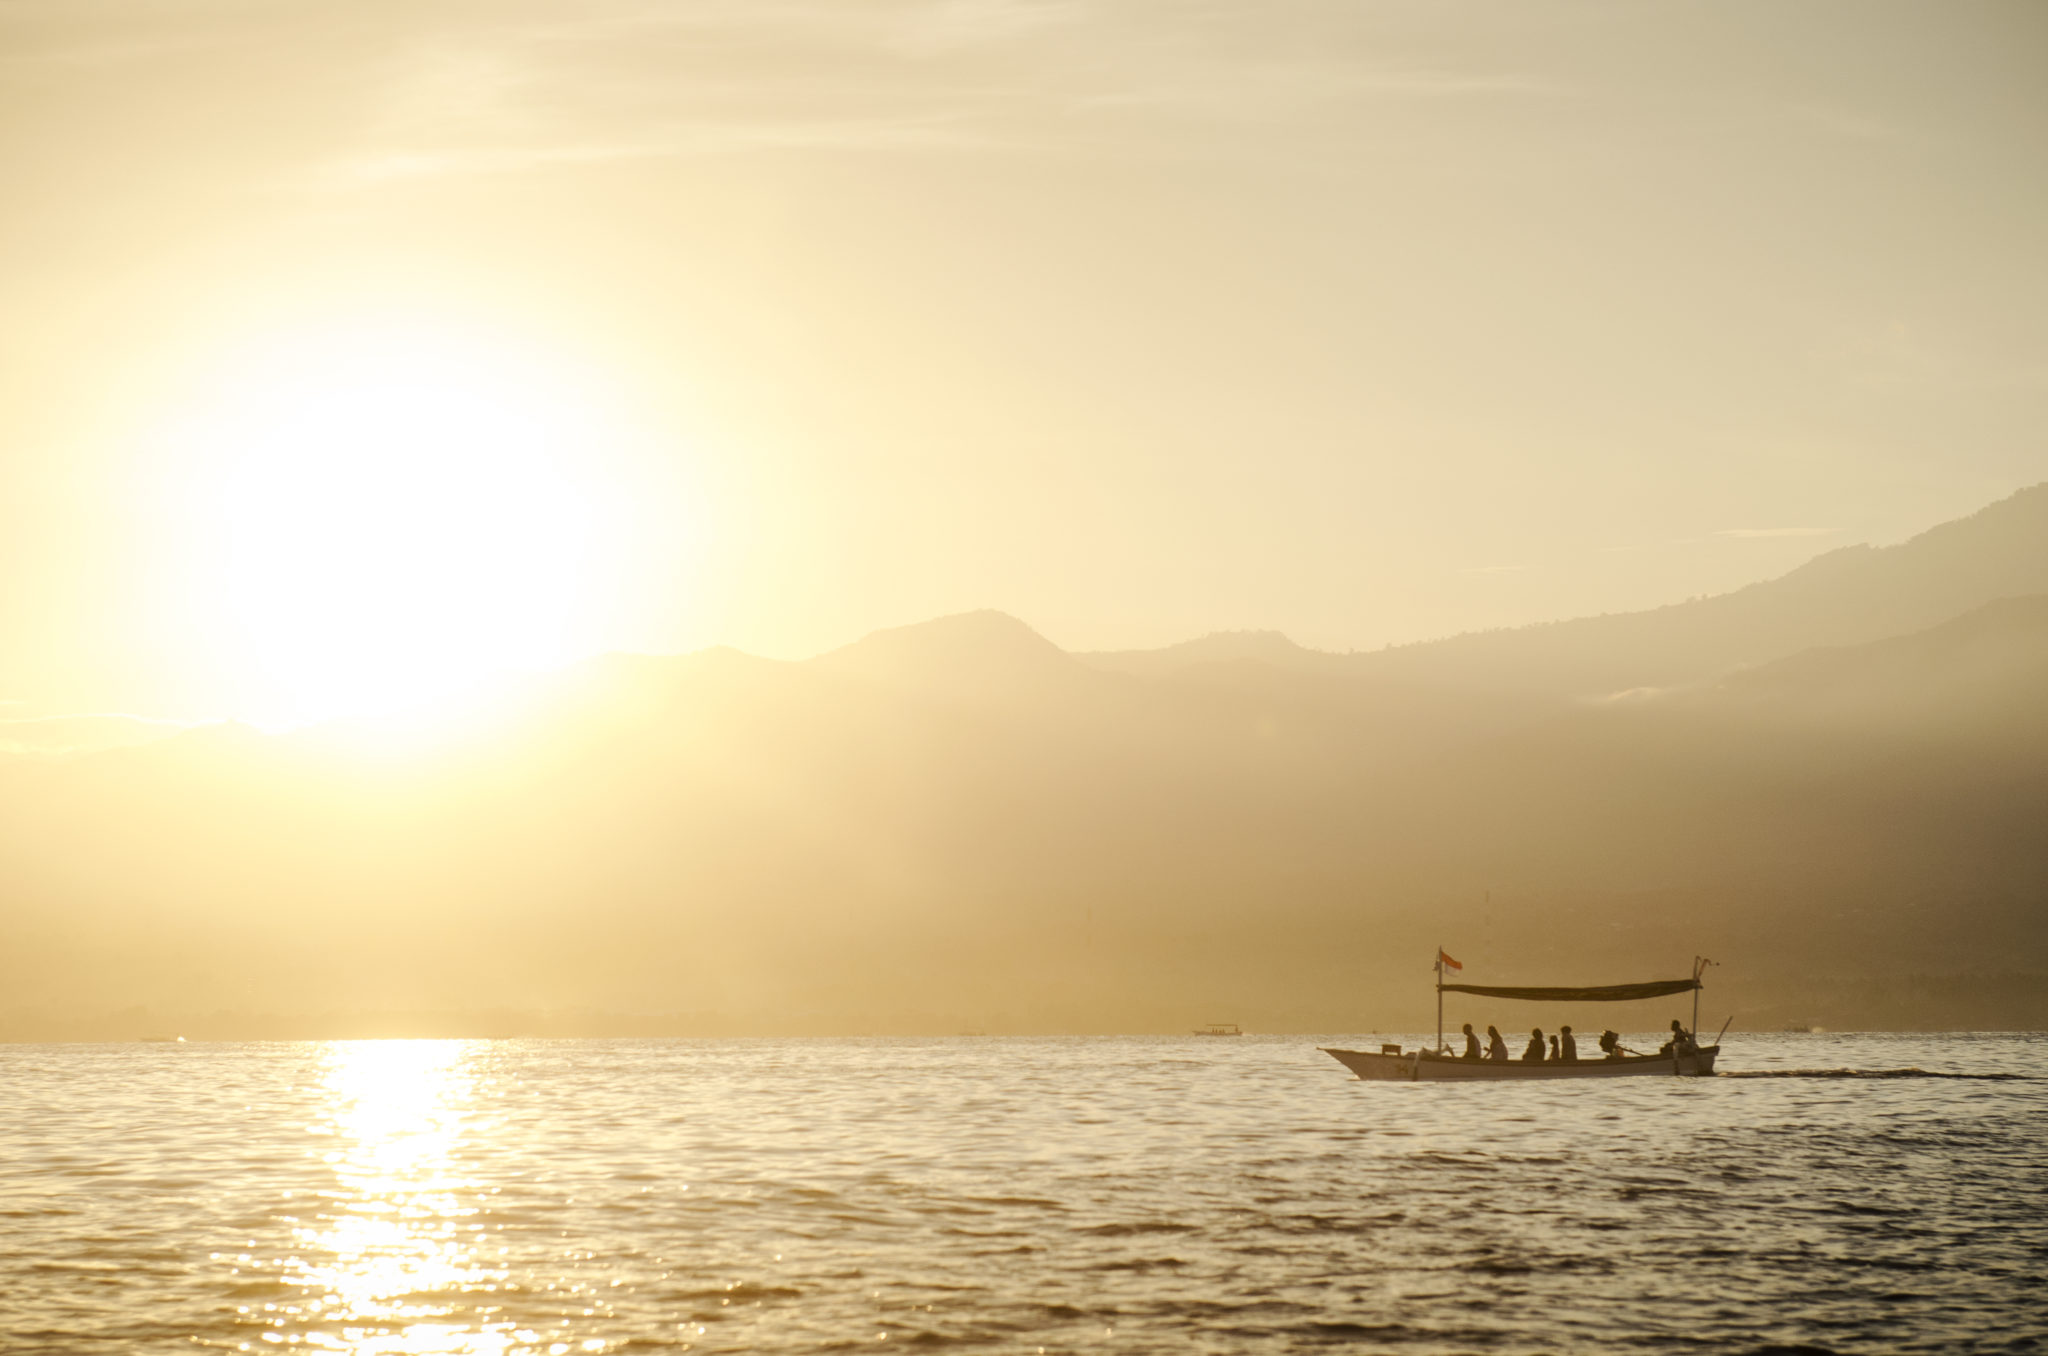 Indonesien-Reisetipps-Lovina